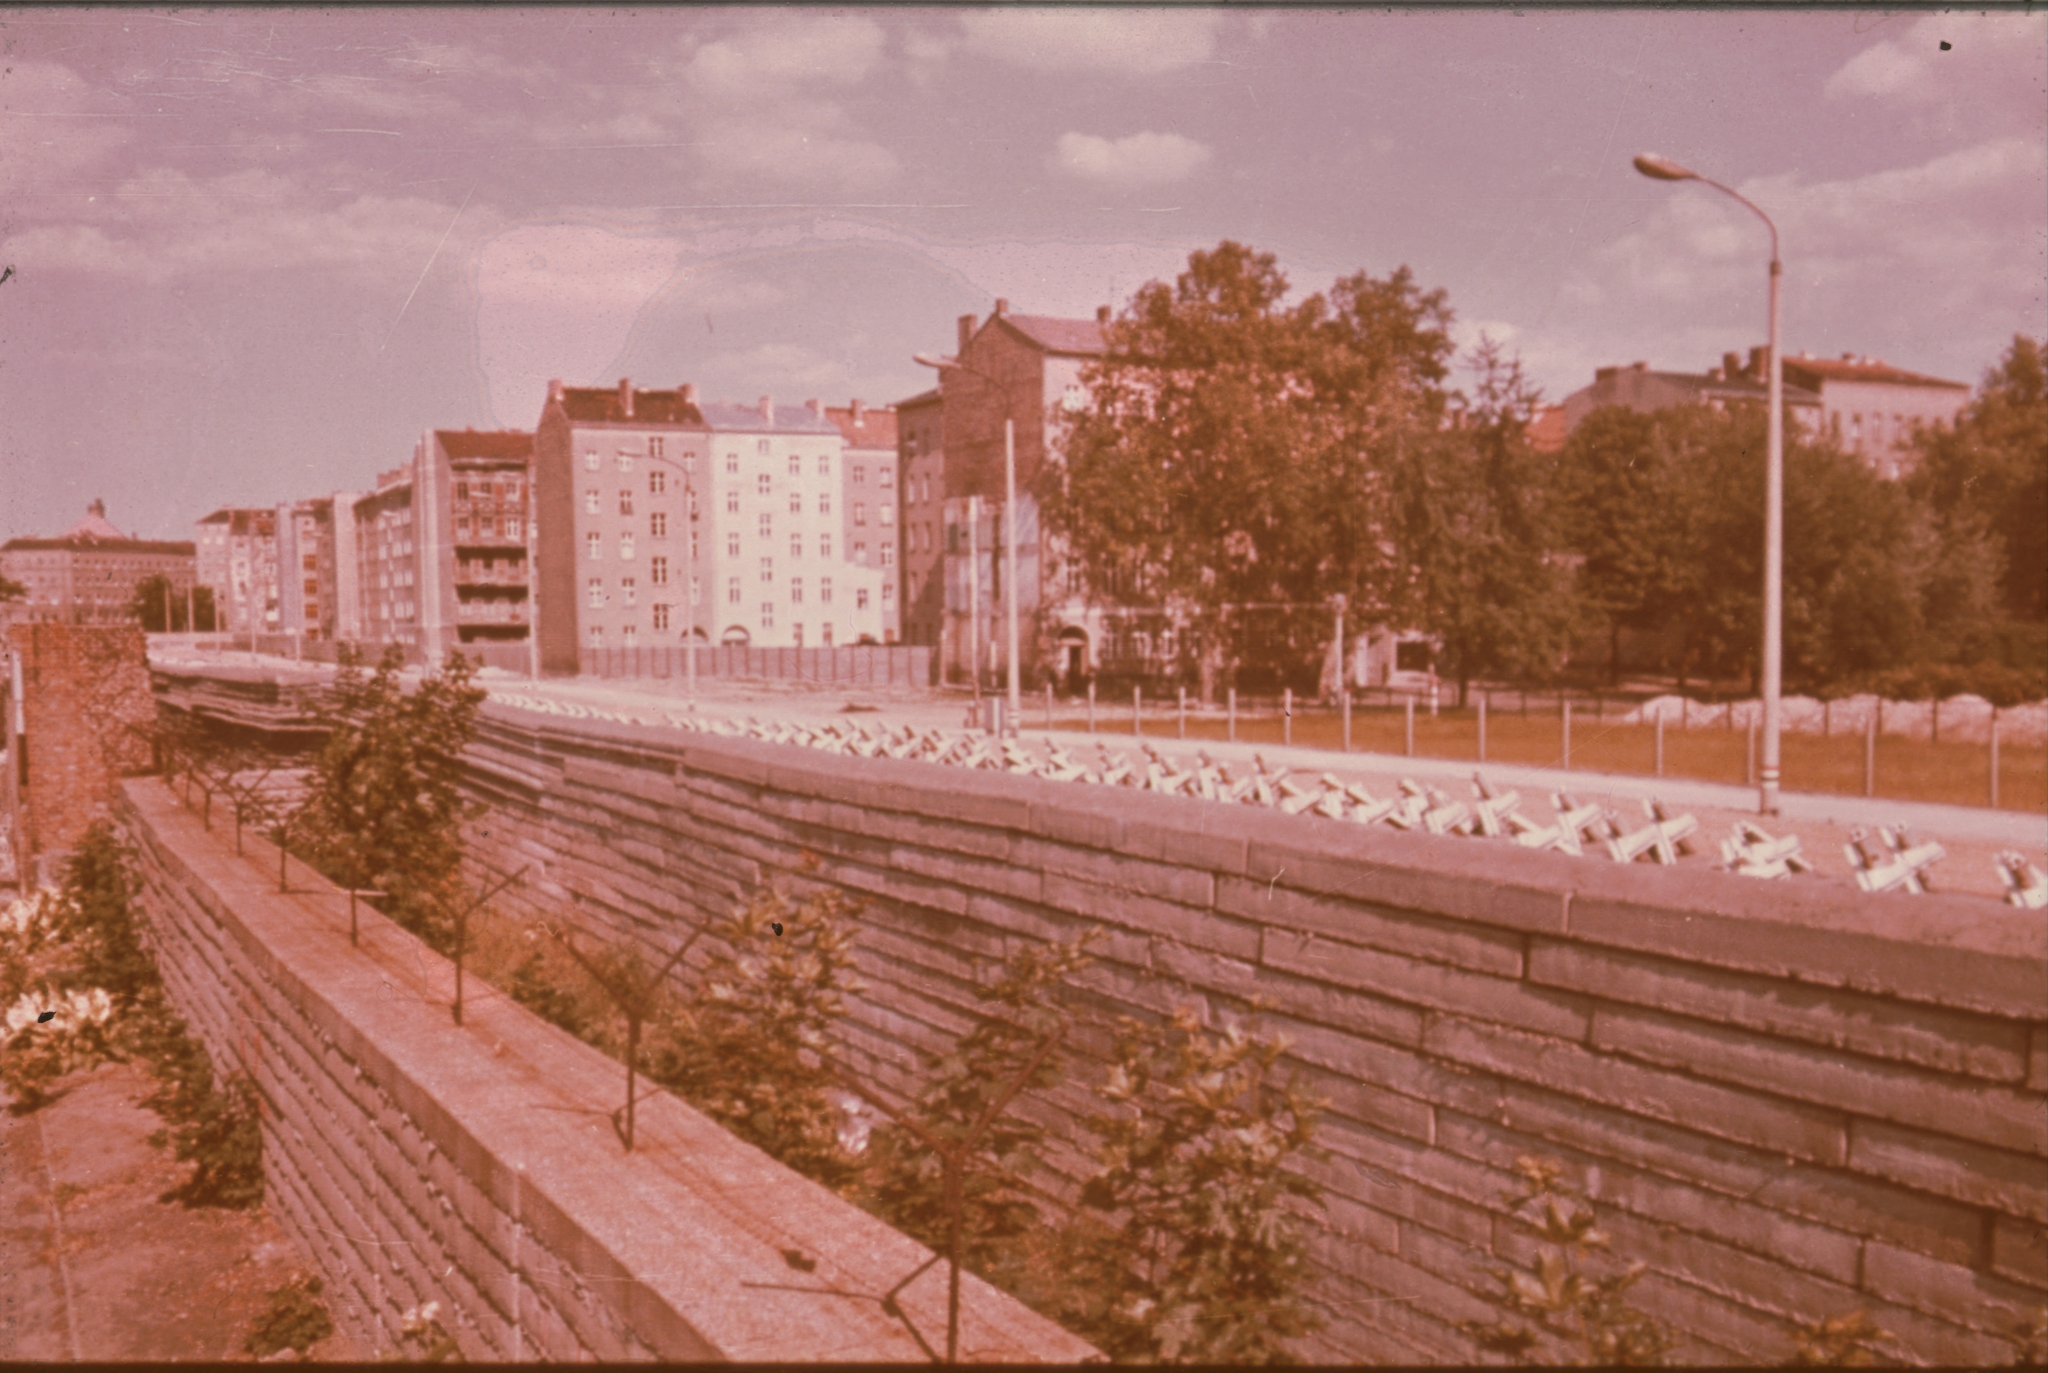 Die Berliner Mauer um 1973 - Berlin Wall - Daniel Rohde-Kage 49